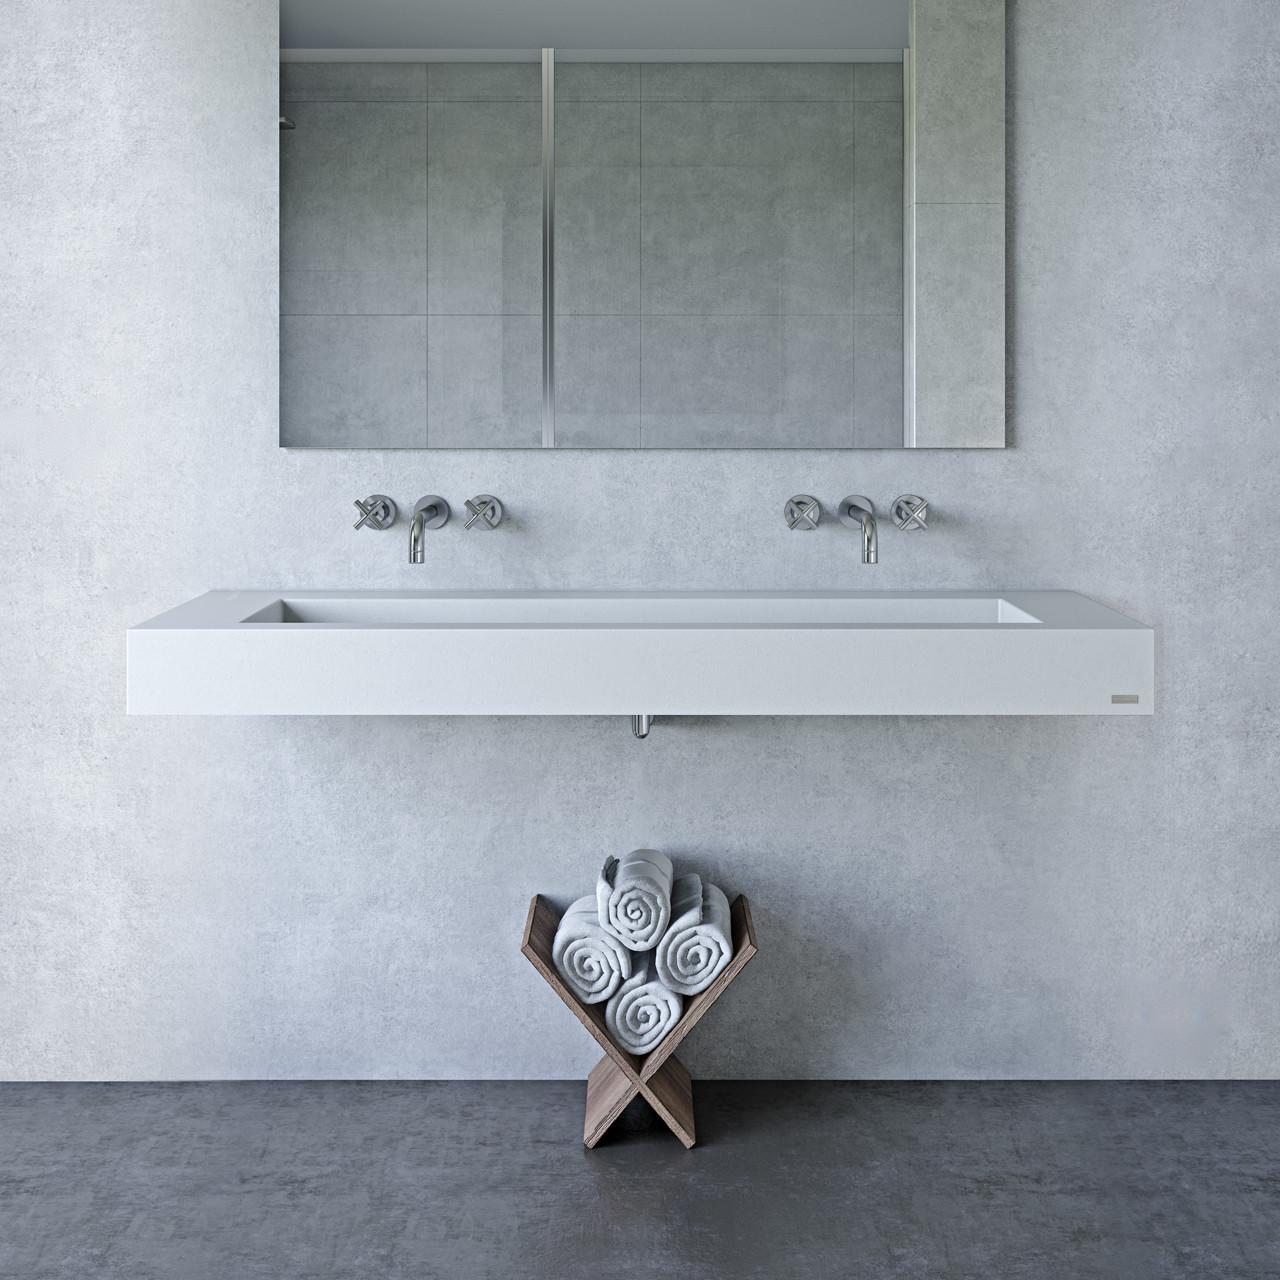 60 Floating ADA Concrete Bathroom Sink